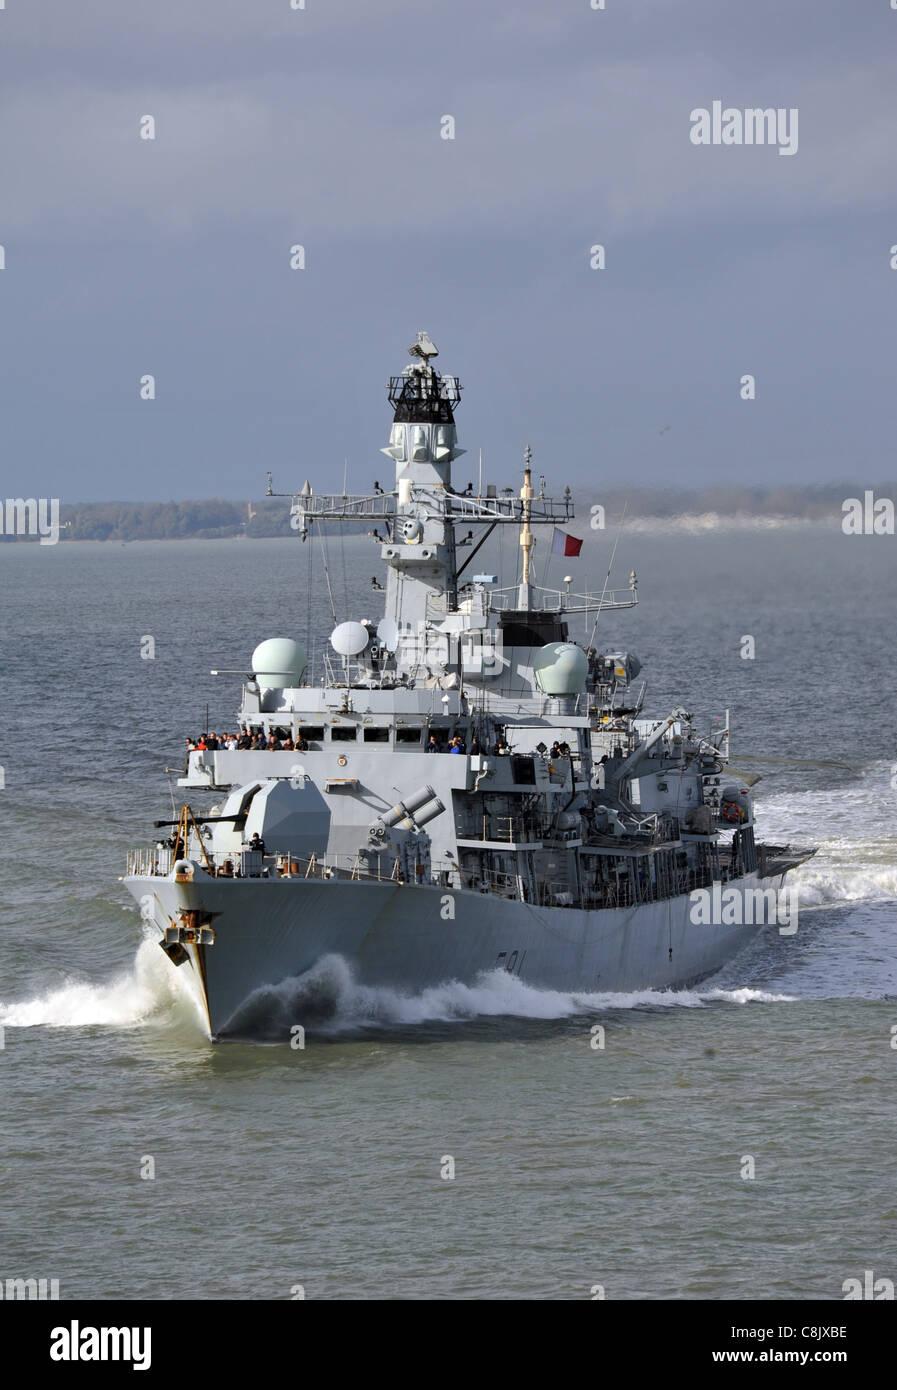 HMS Sutherland of the British Royal Navy. - Stock Image